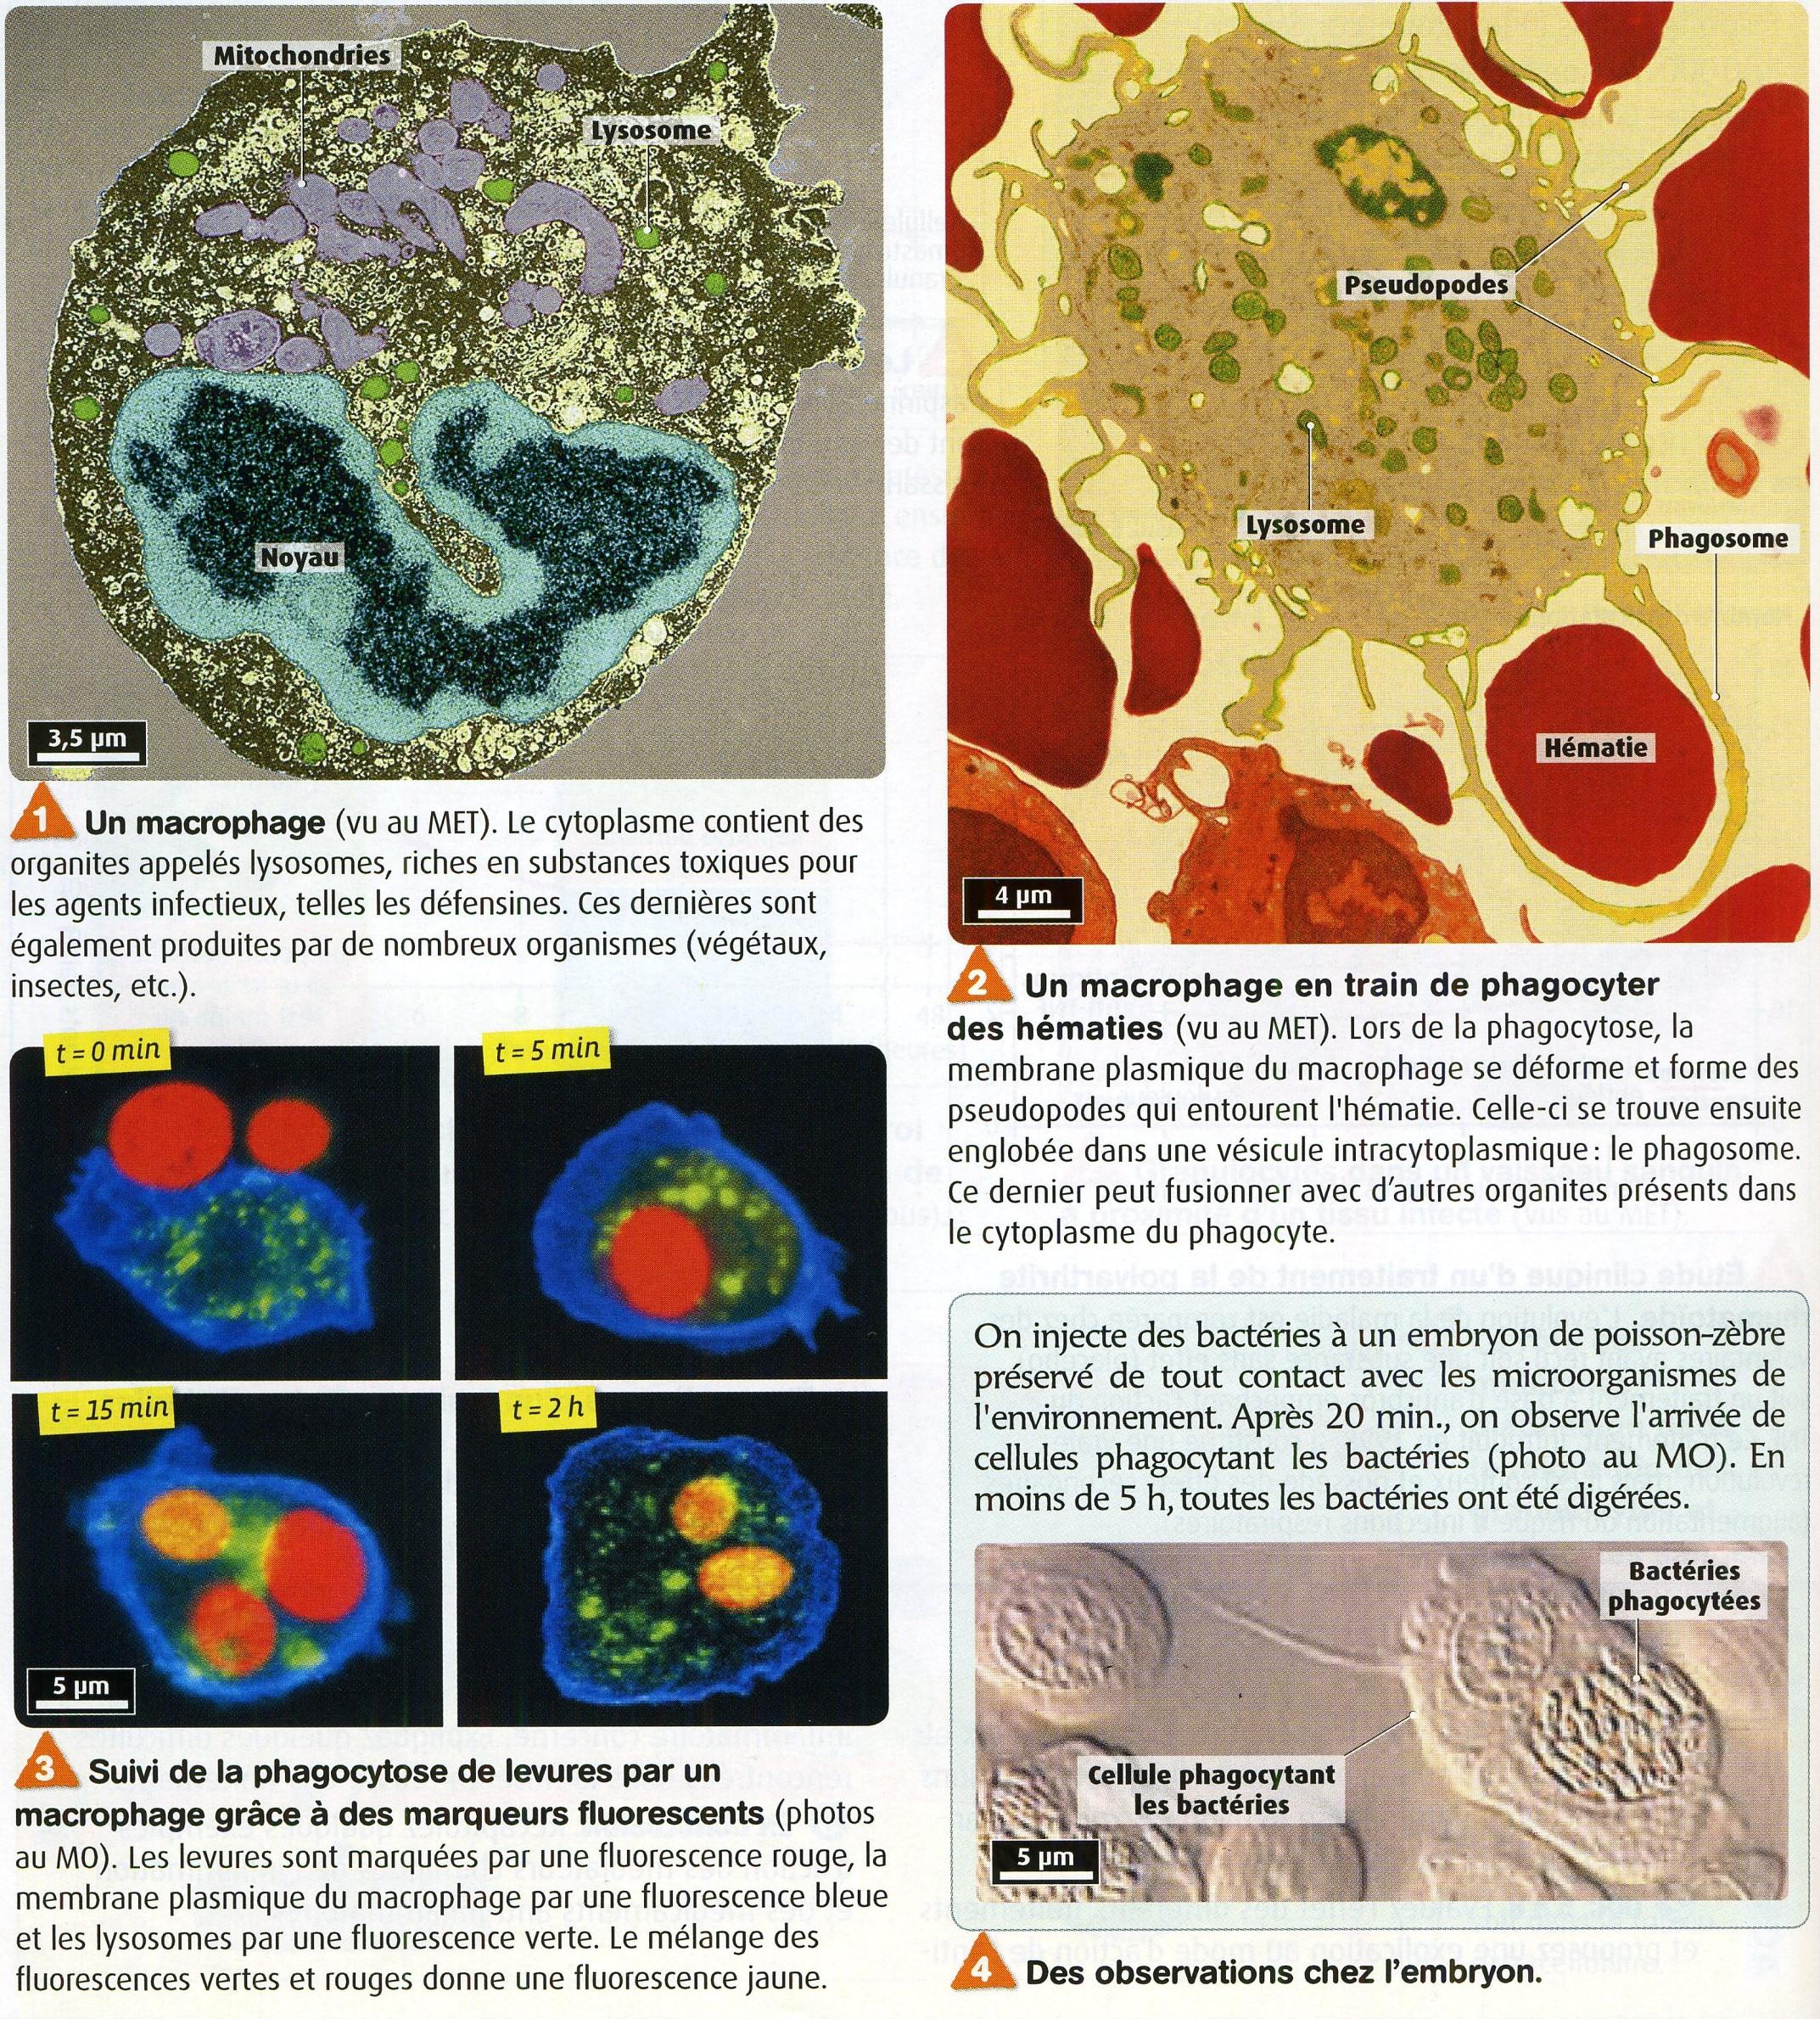 Phagocytose bis